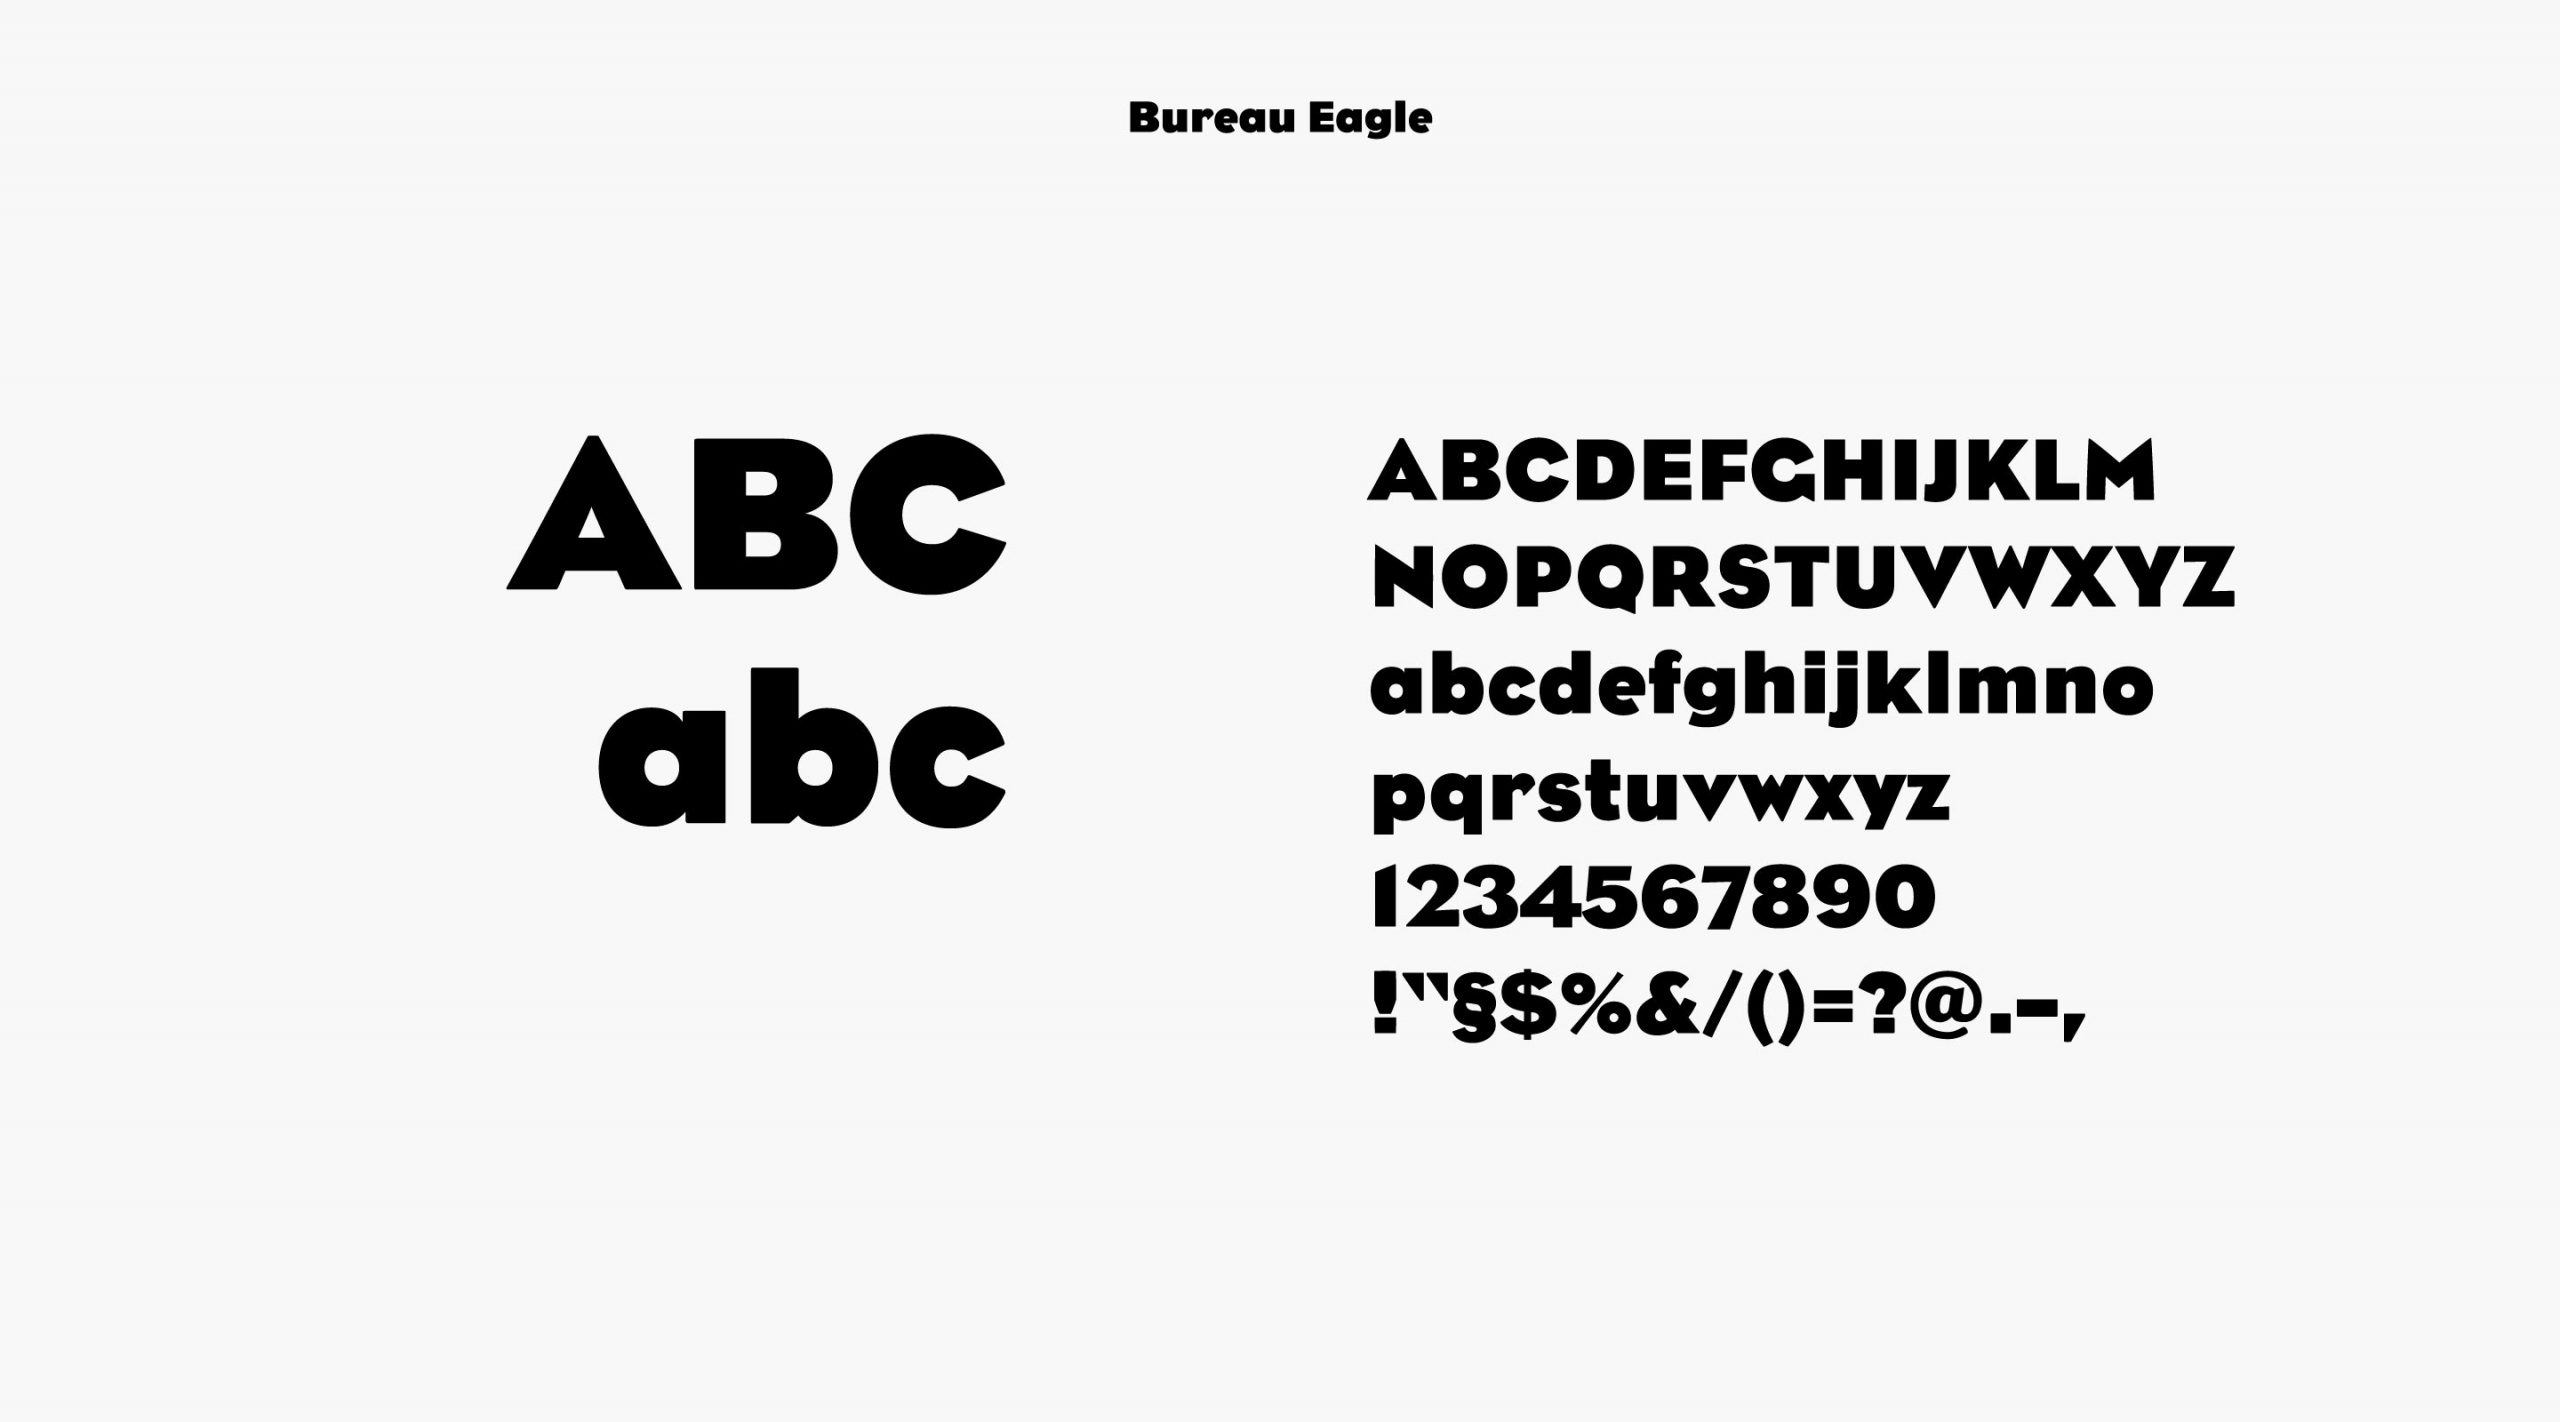 ikono.TV Branding Typografie – Uthmöller und Partner